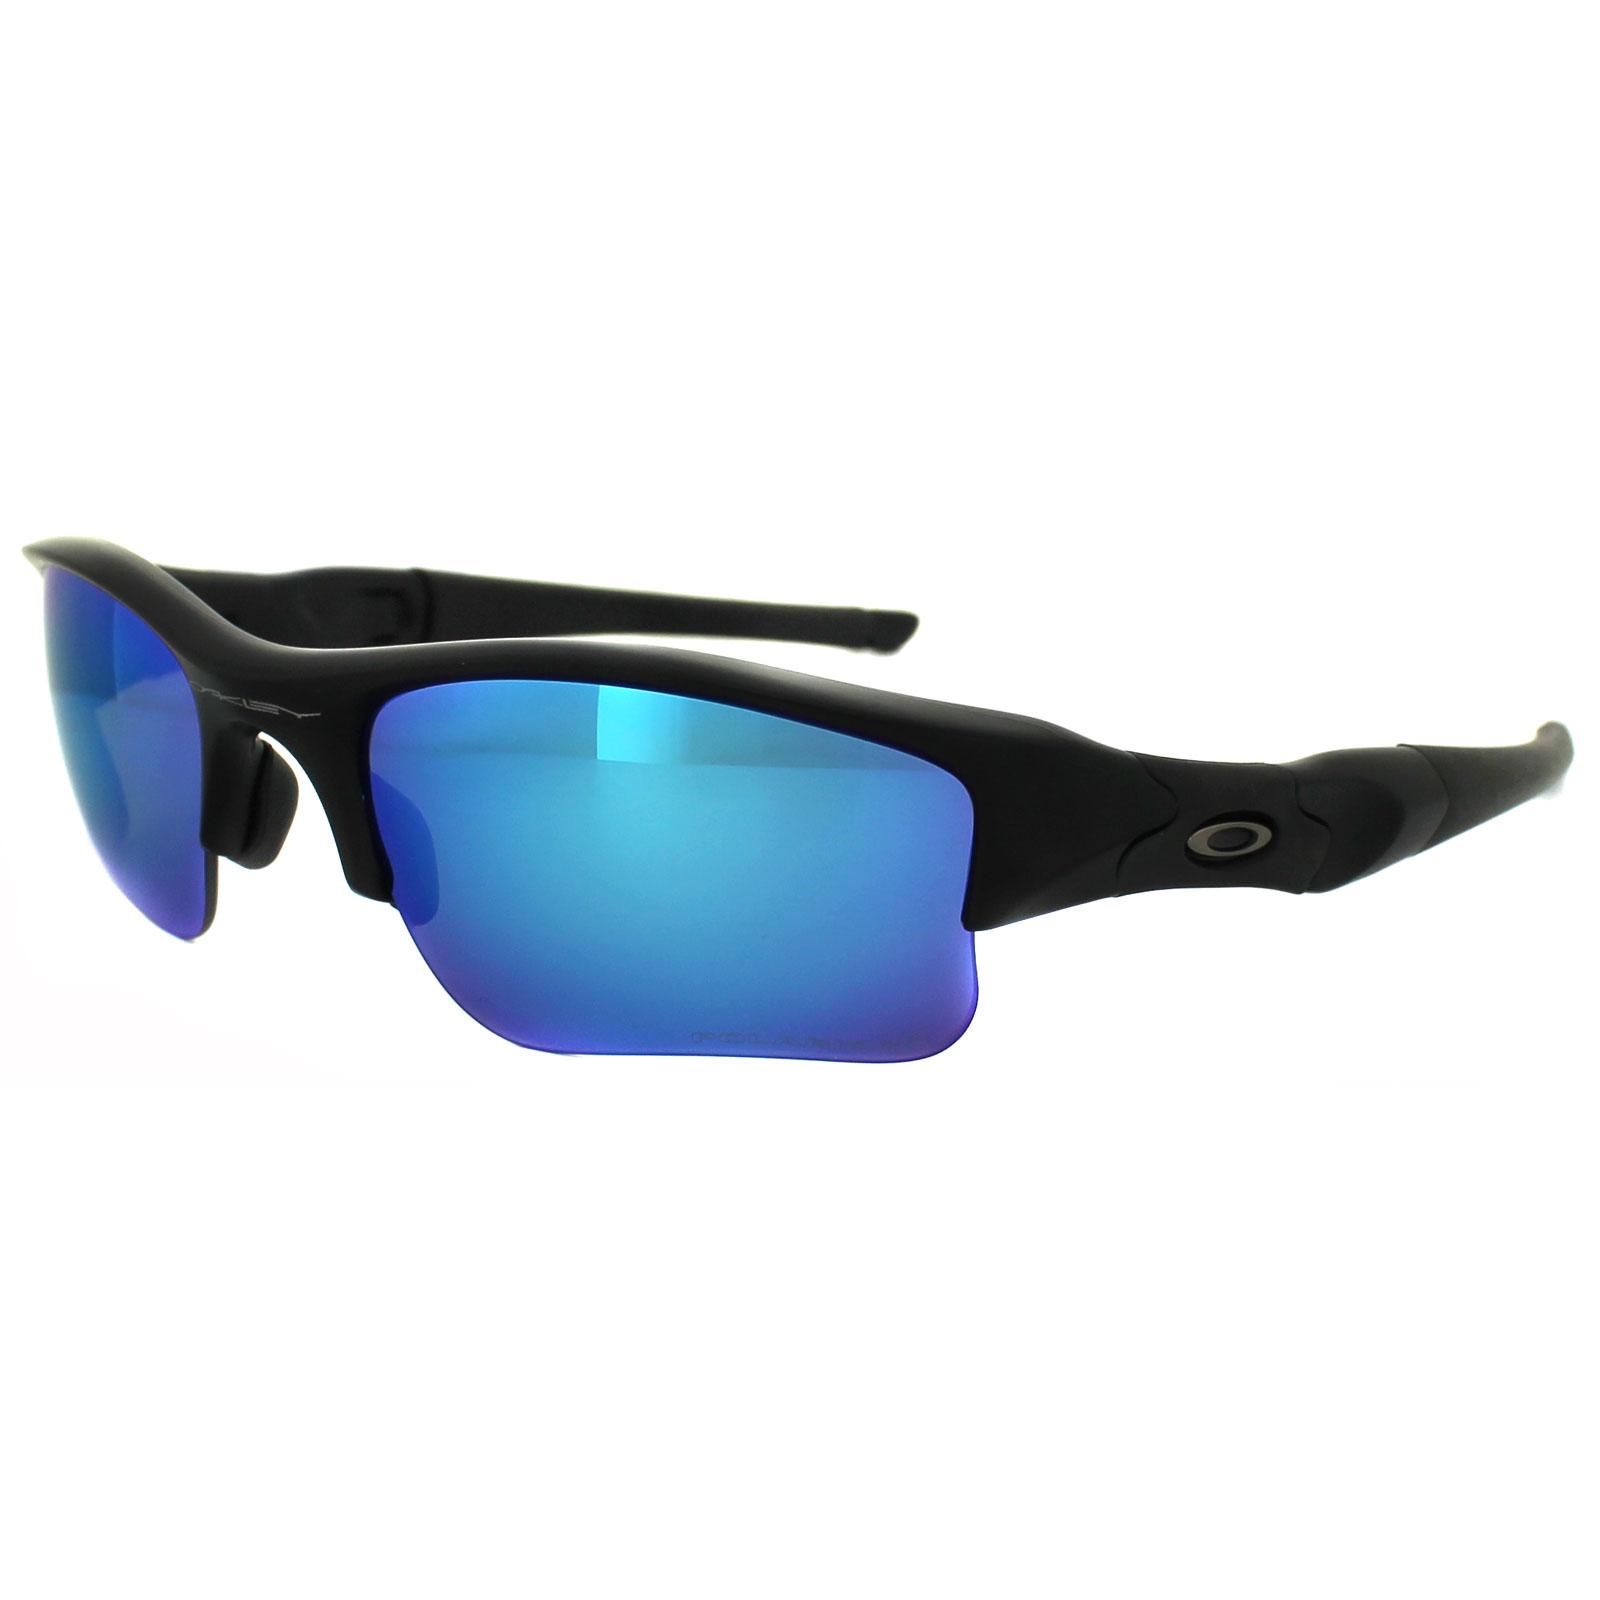 Oakley Polarized Flak Jacket Sunglasses